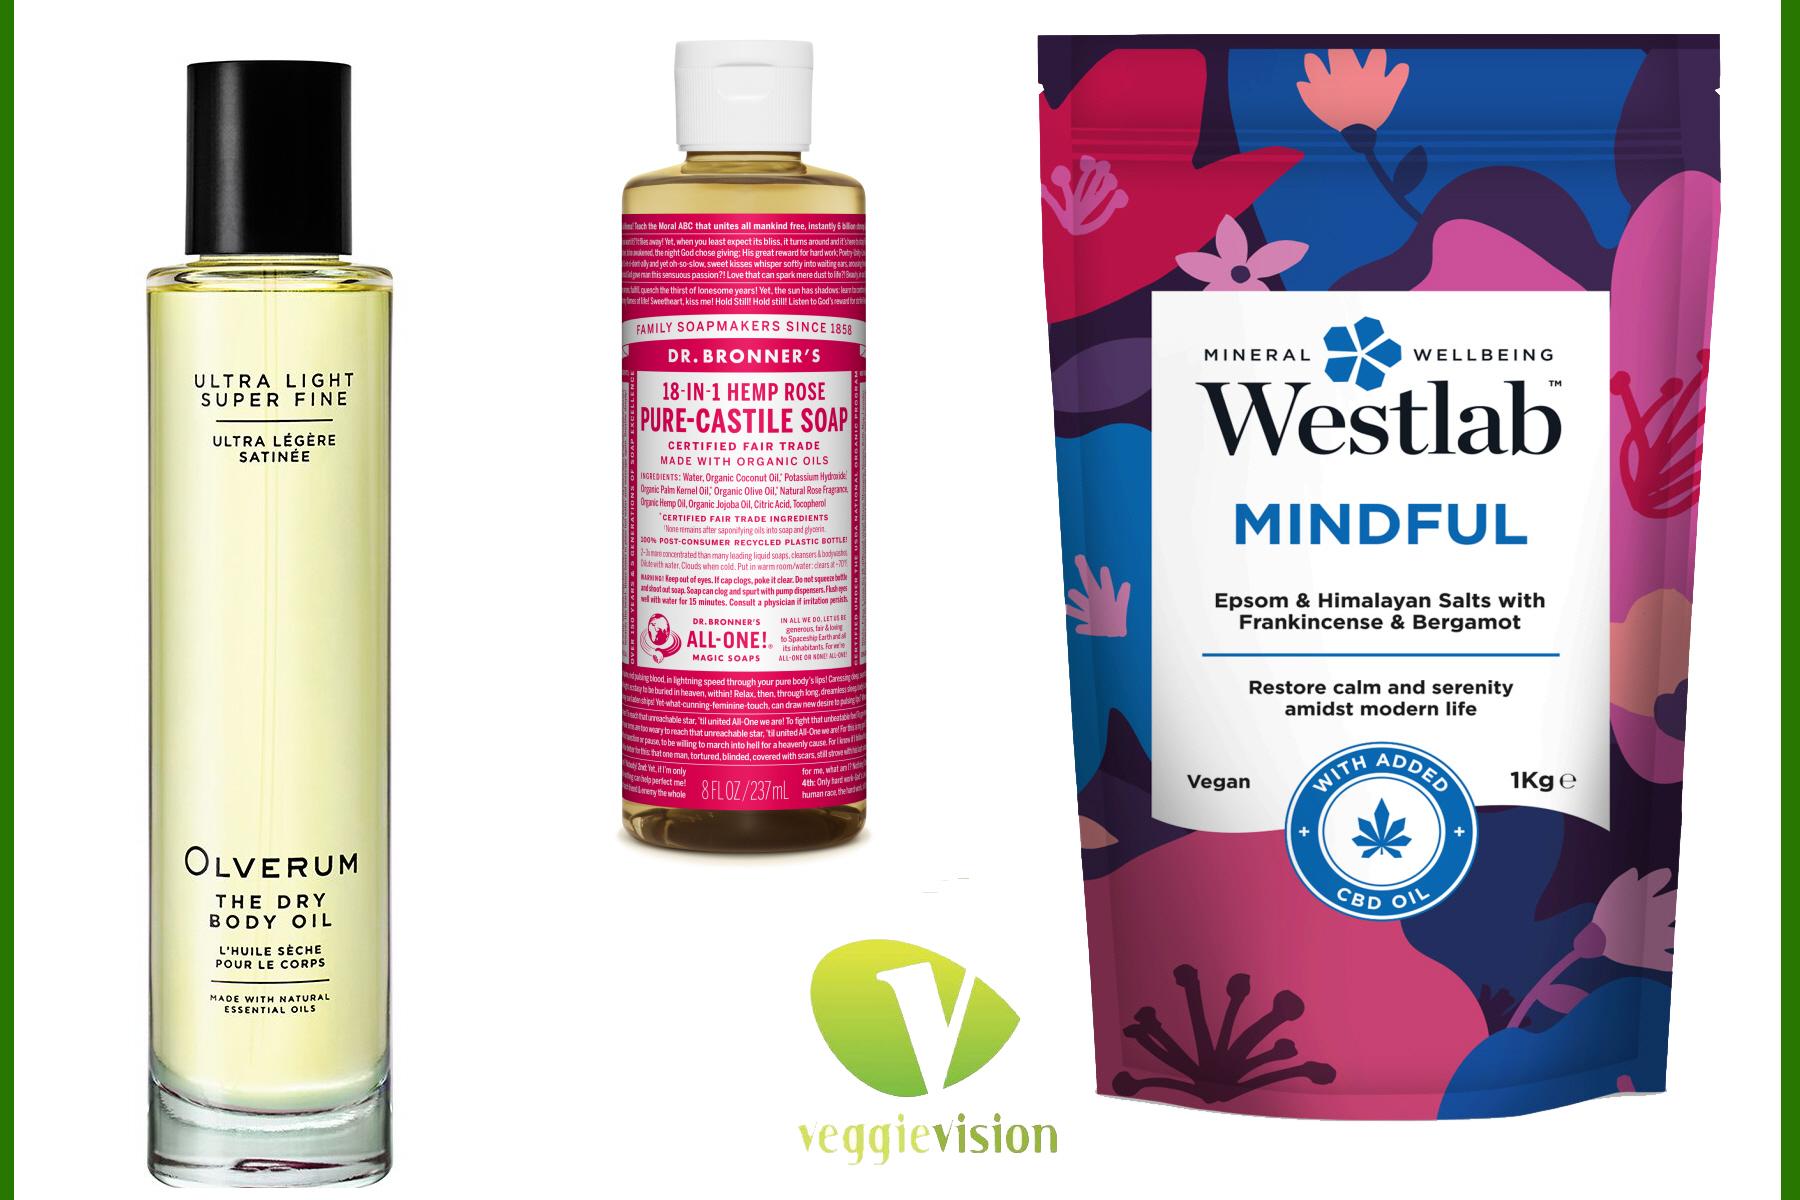 Quick Beauty Update – Olverum Dry Body Oil, Westlab Bath Salts & Dr. Bronner's Rose Pure-Castile Liquid Soap